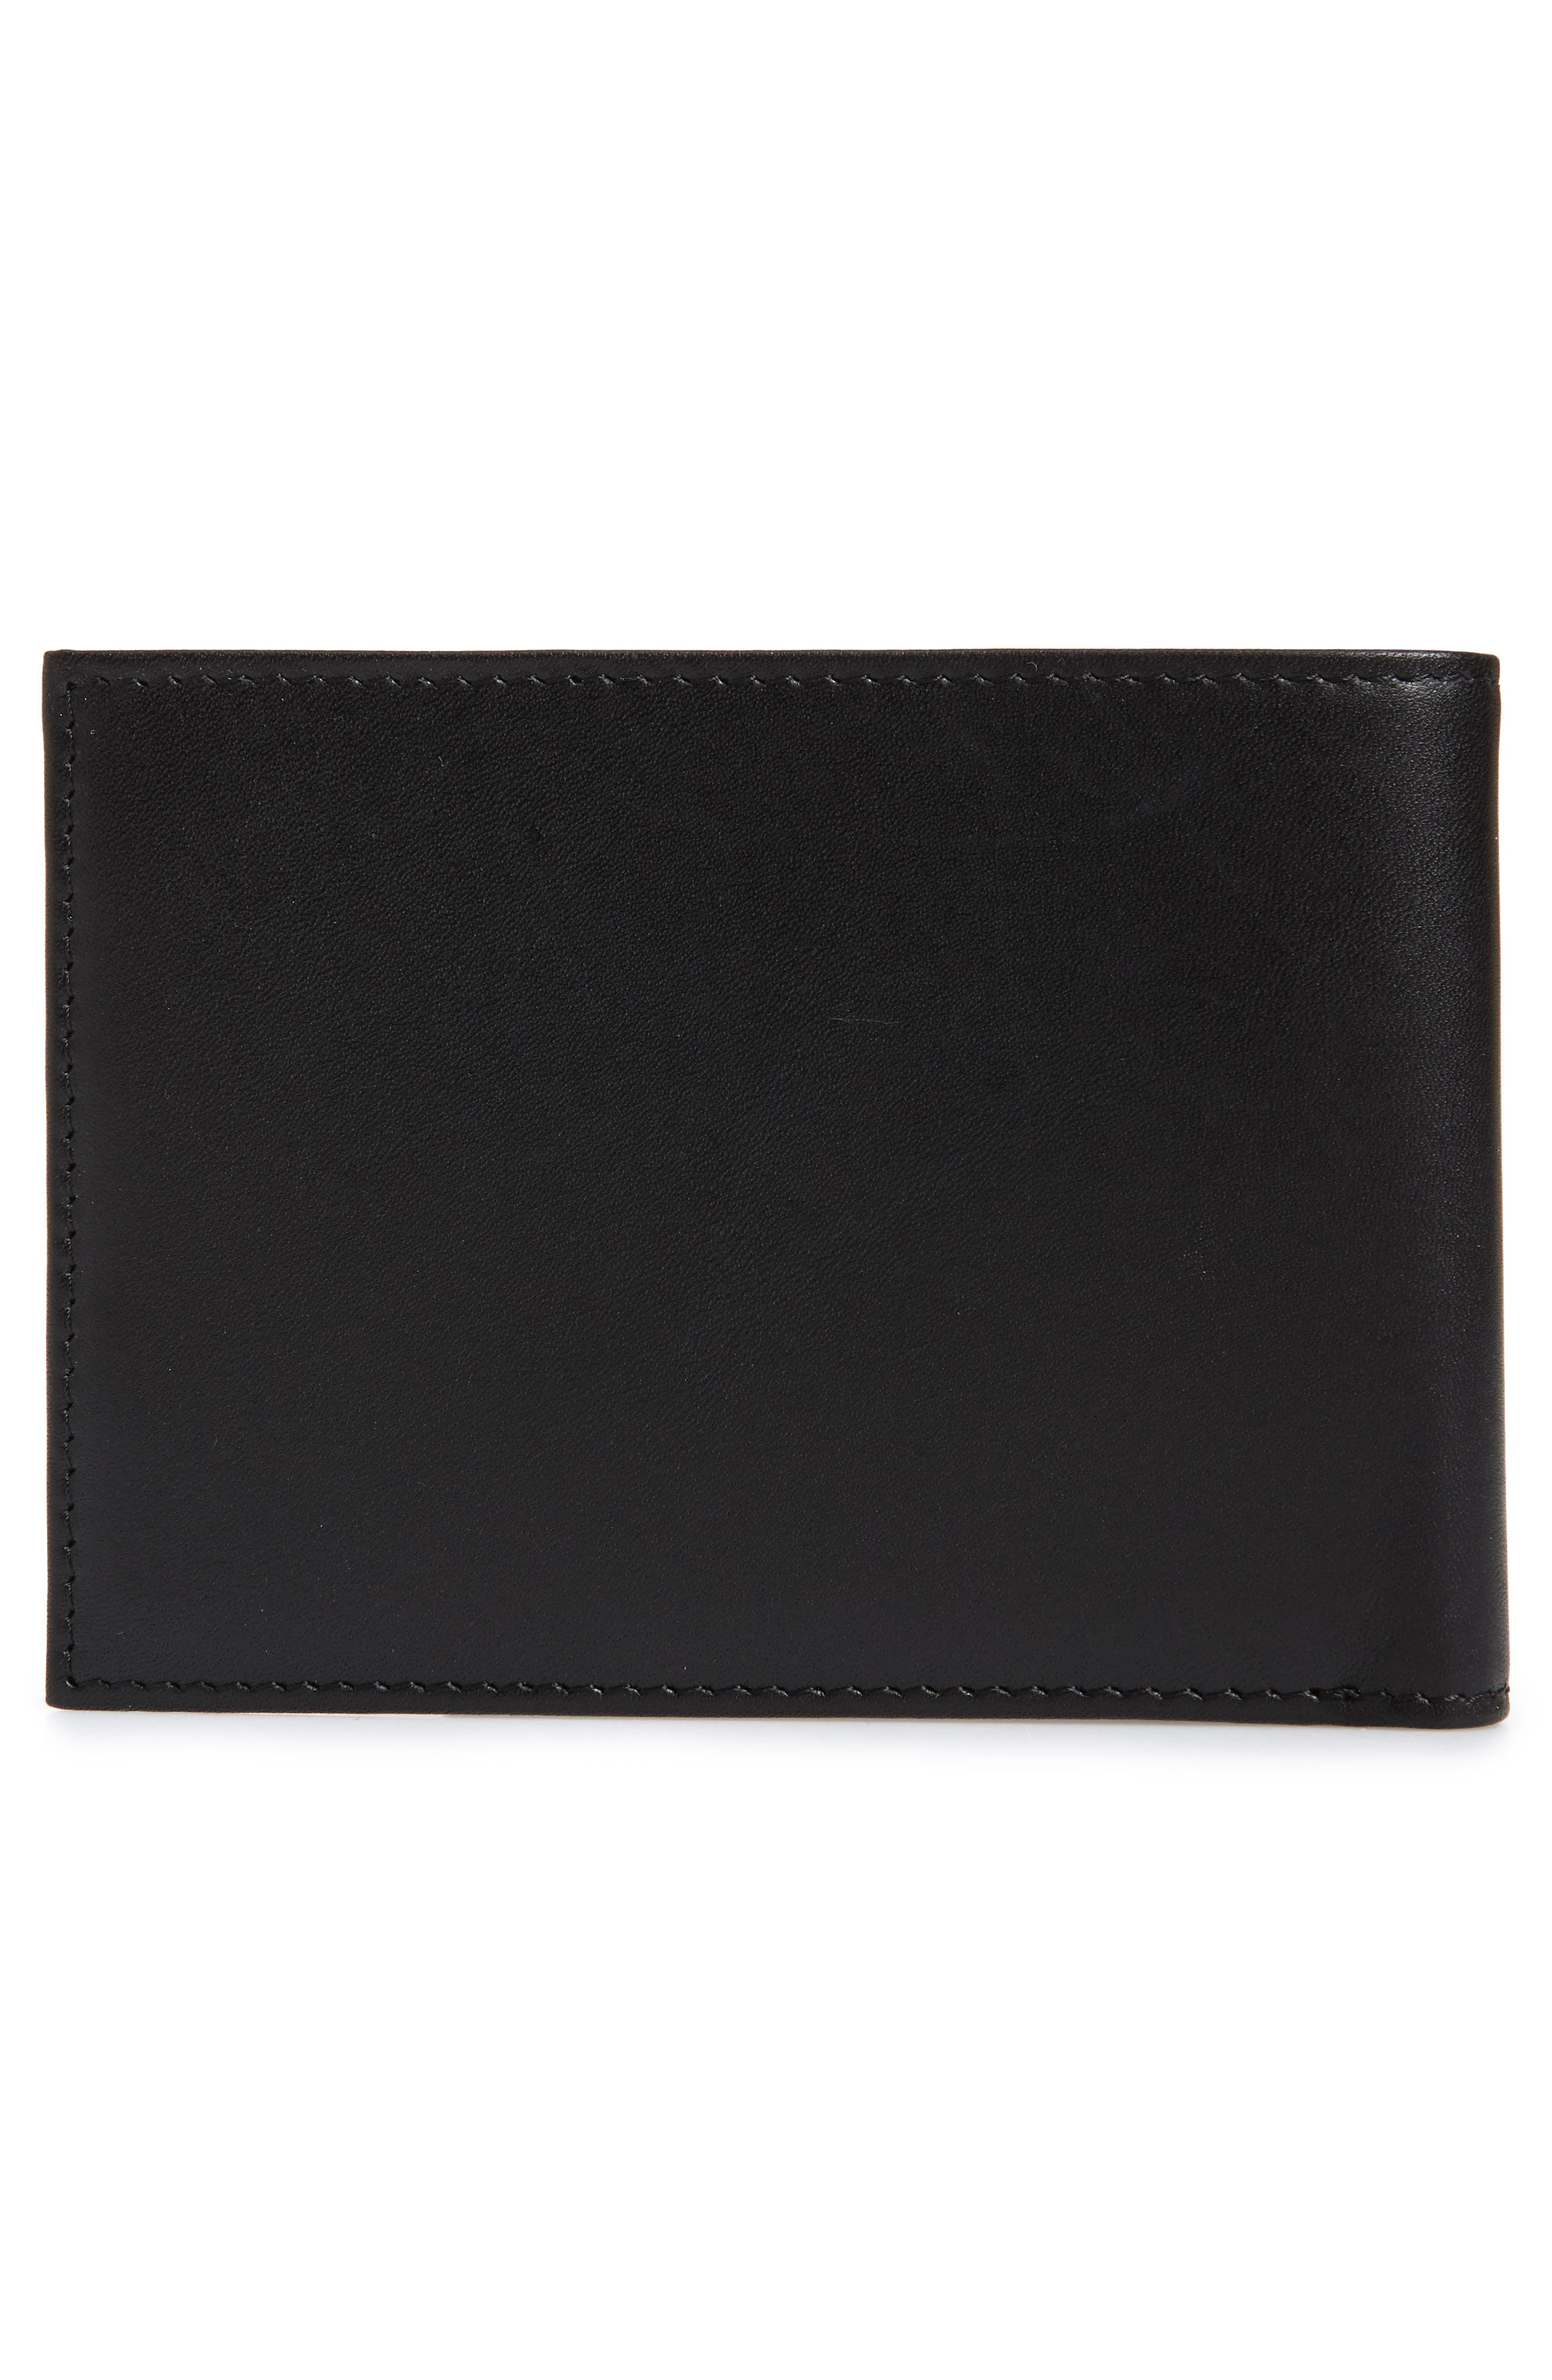 Chelsea Leather Wallet,                             Alternate thumbnail 3, color,                             BLACK